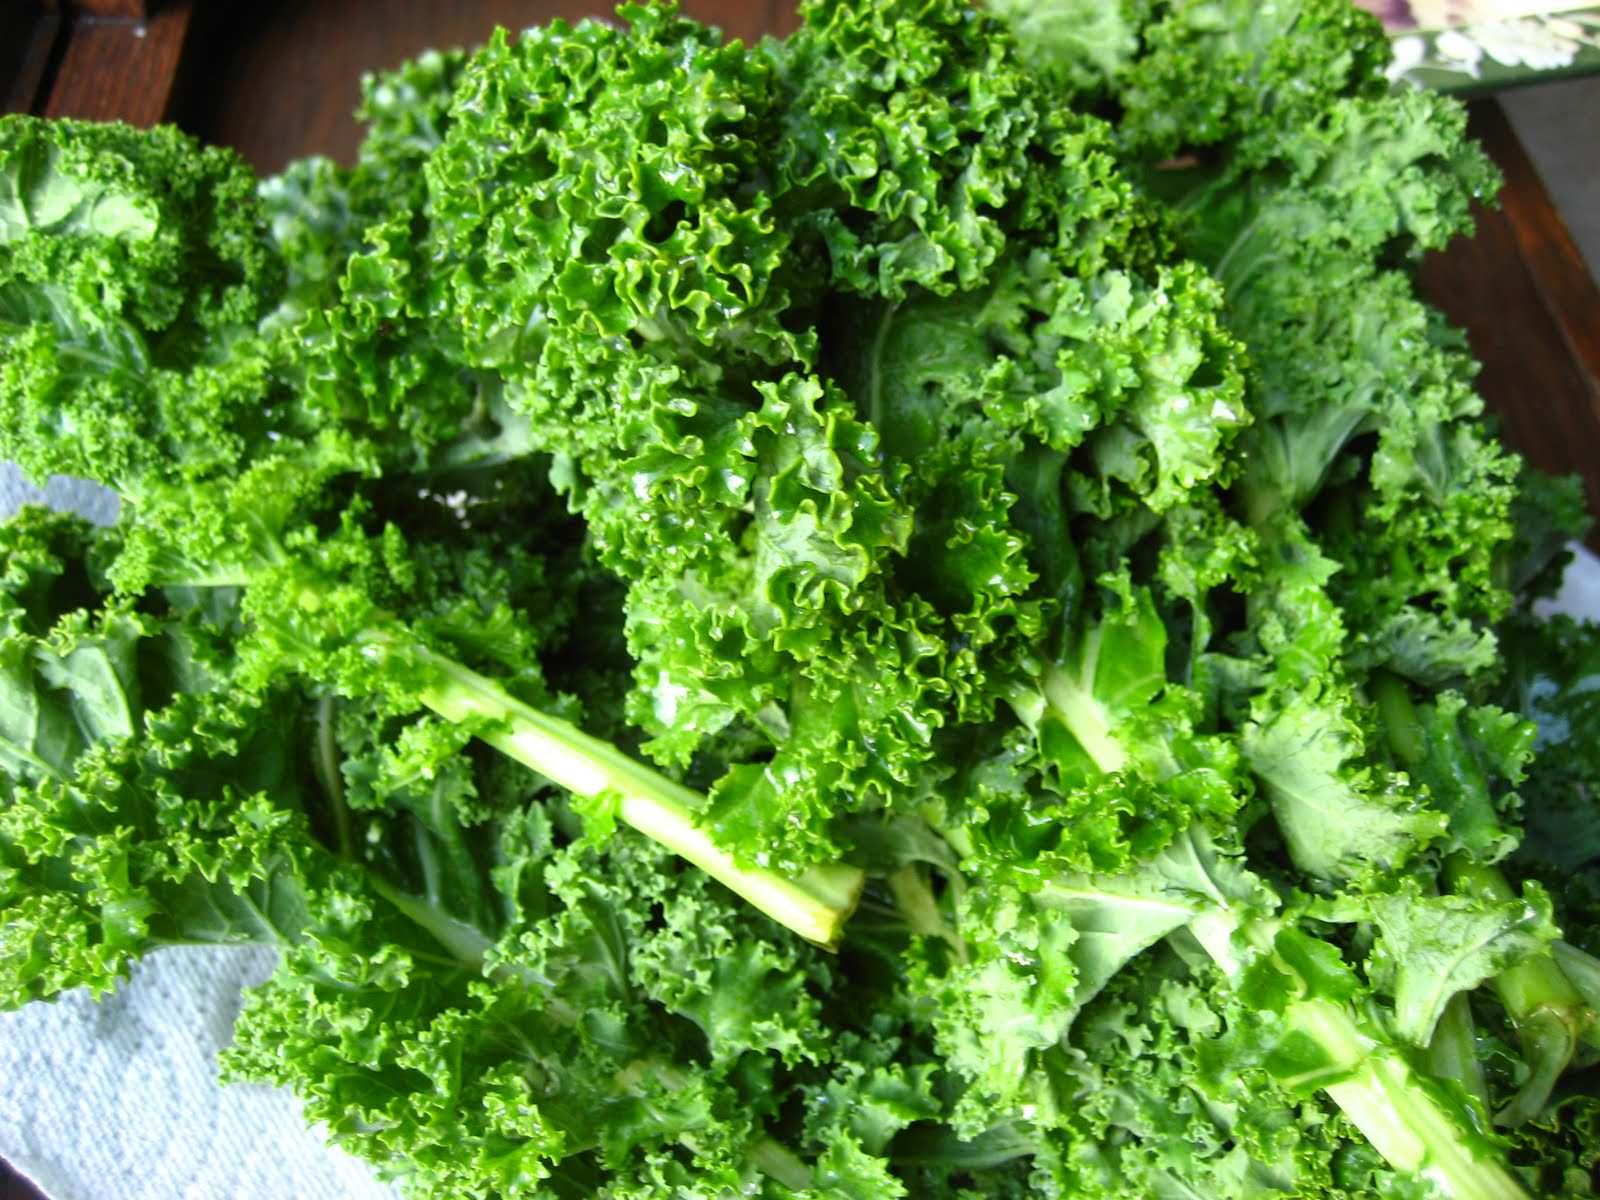 Kale - a superfood?